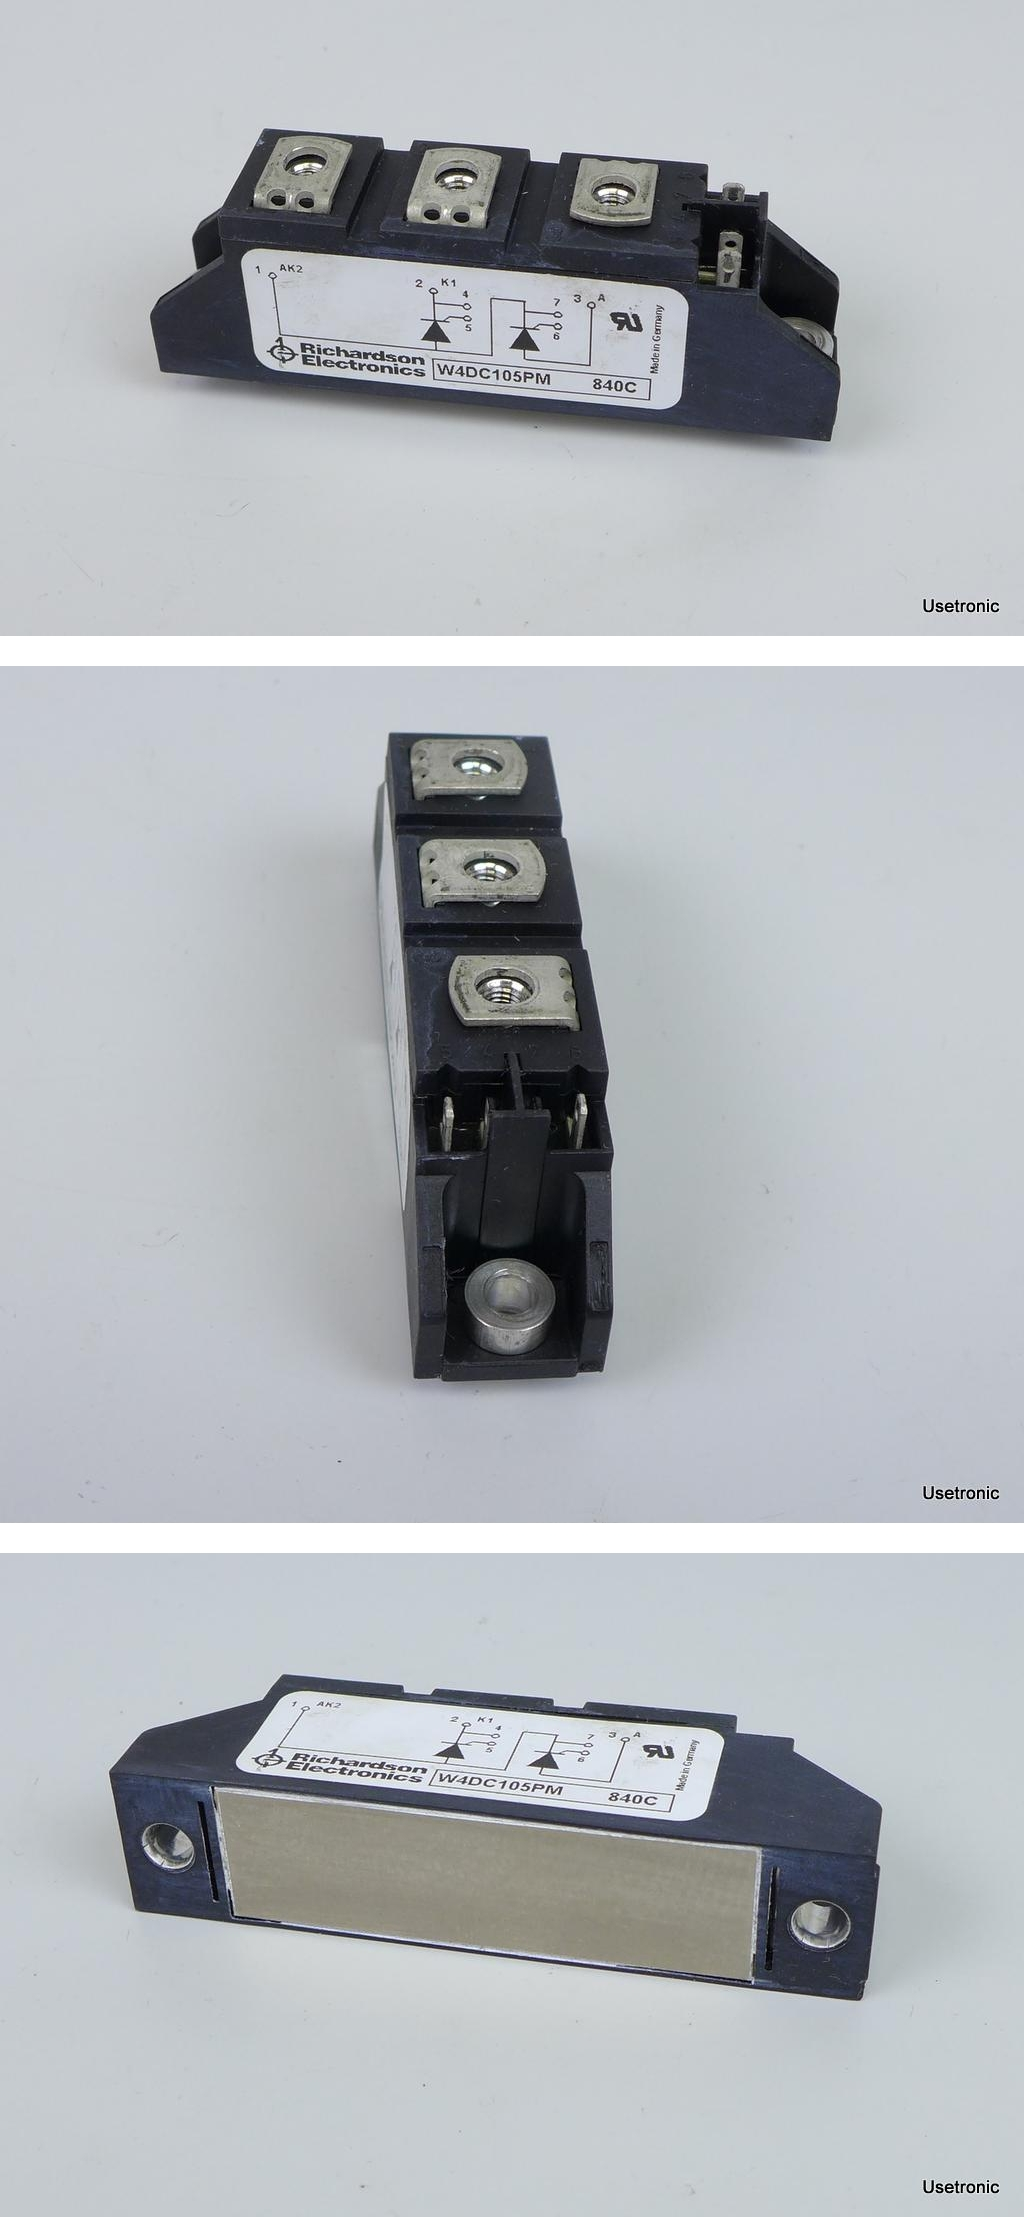 PP2185 Insulated gate bipolar transistor IGBT W4DC105PM 840 C